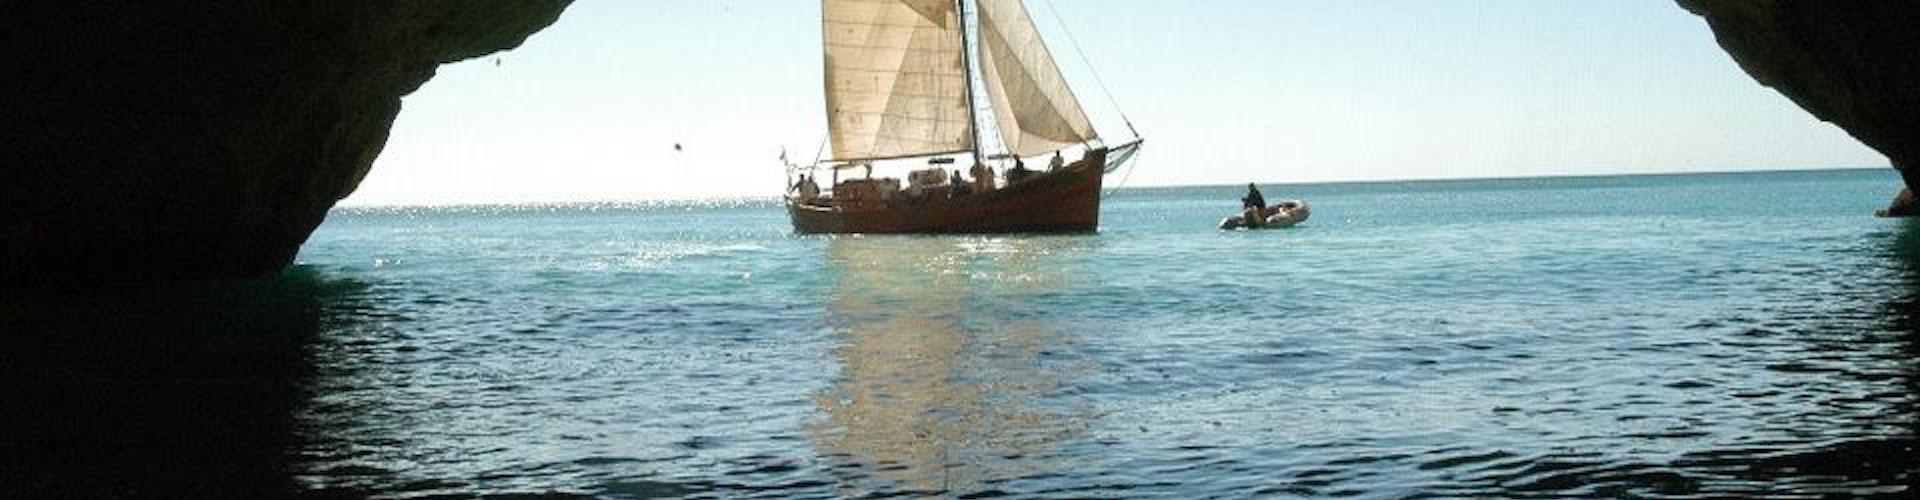 Paseo Pirata Algarve 3